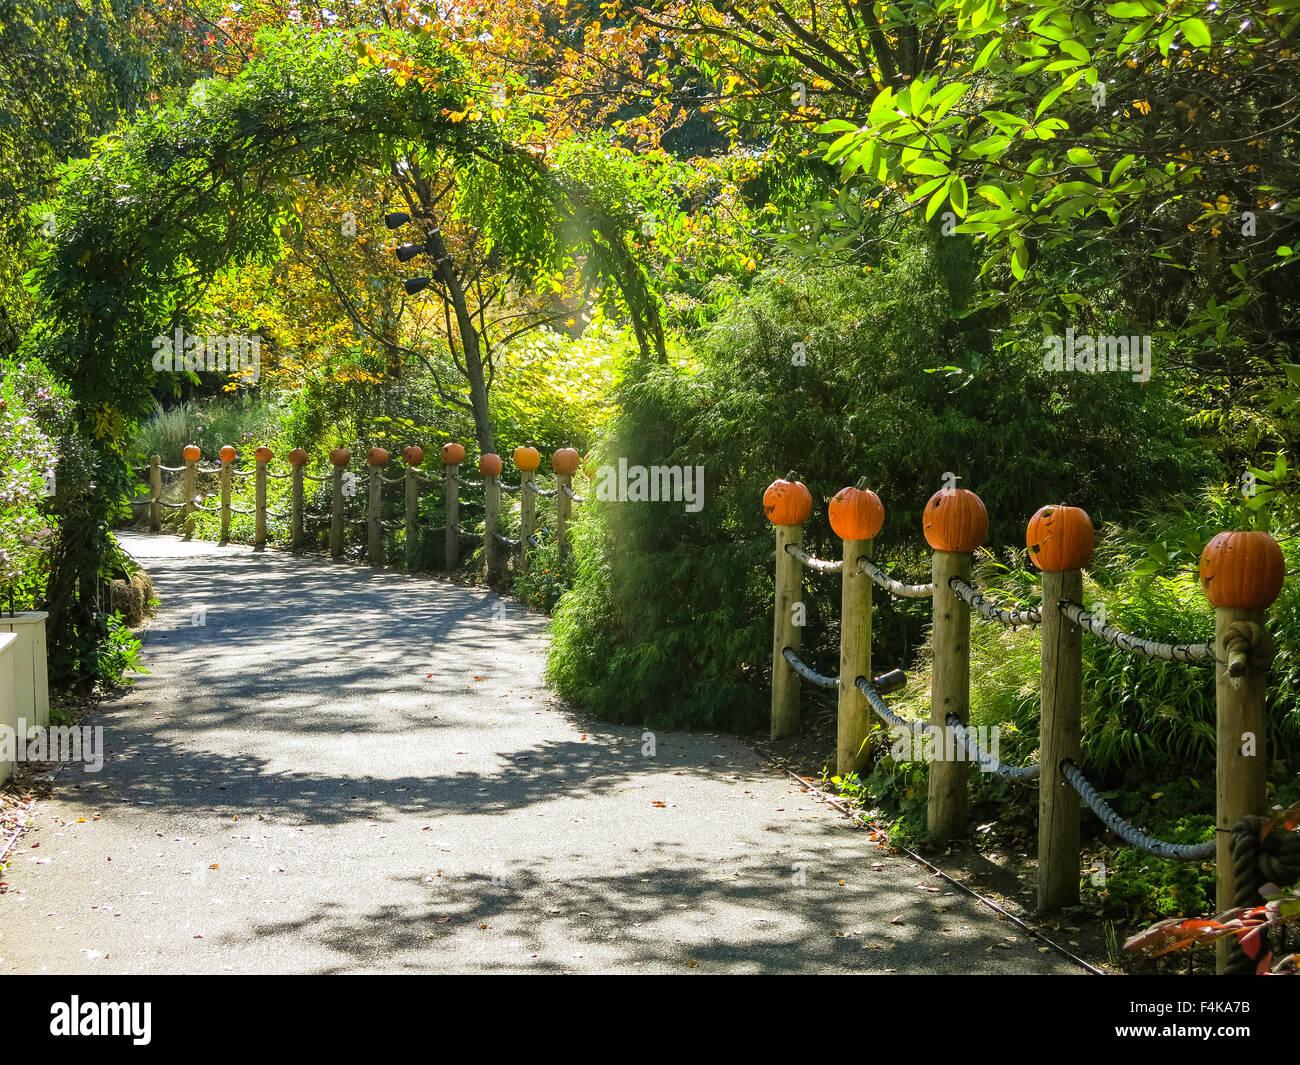 Everett Childrenu0027s Adventure Garden, New York Botanical Garden, The Bronx,  NY, USA